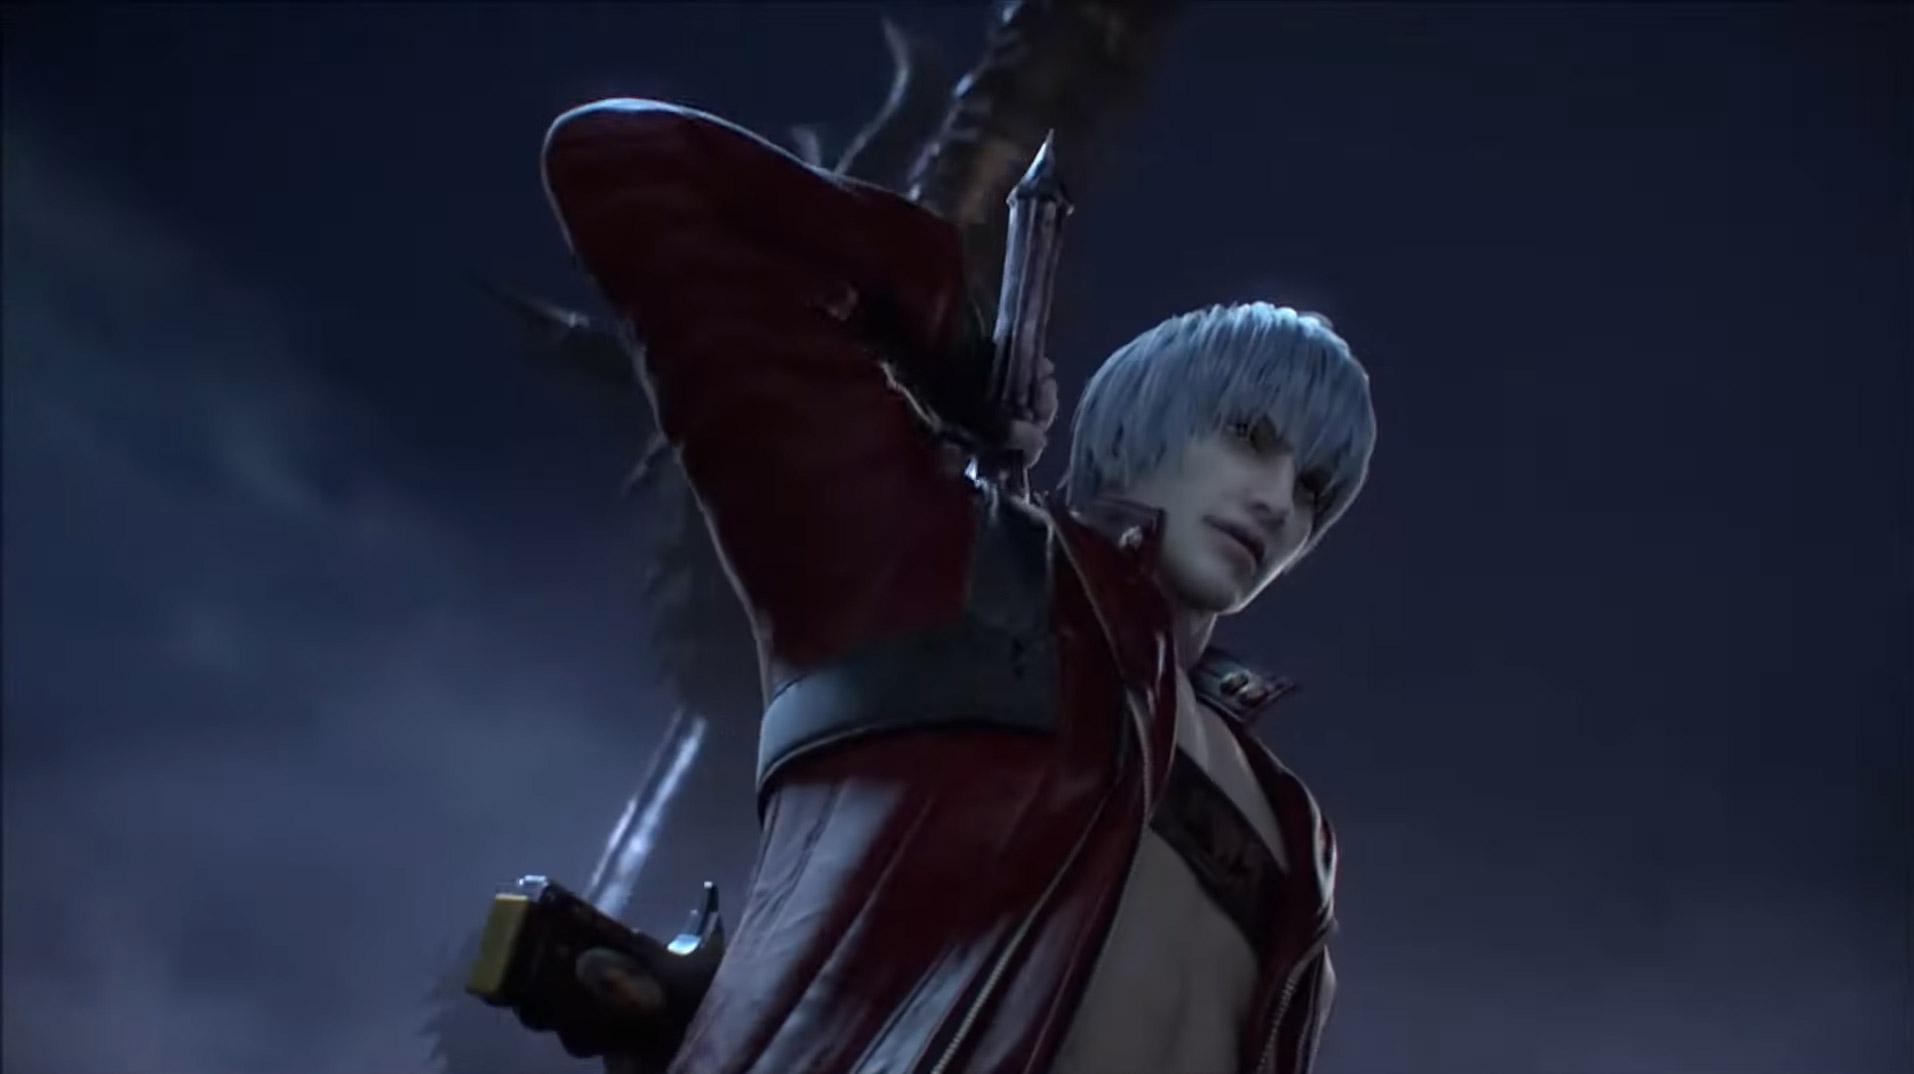 You don't look so hot, Dante screenshot